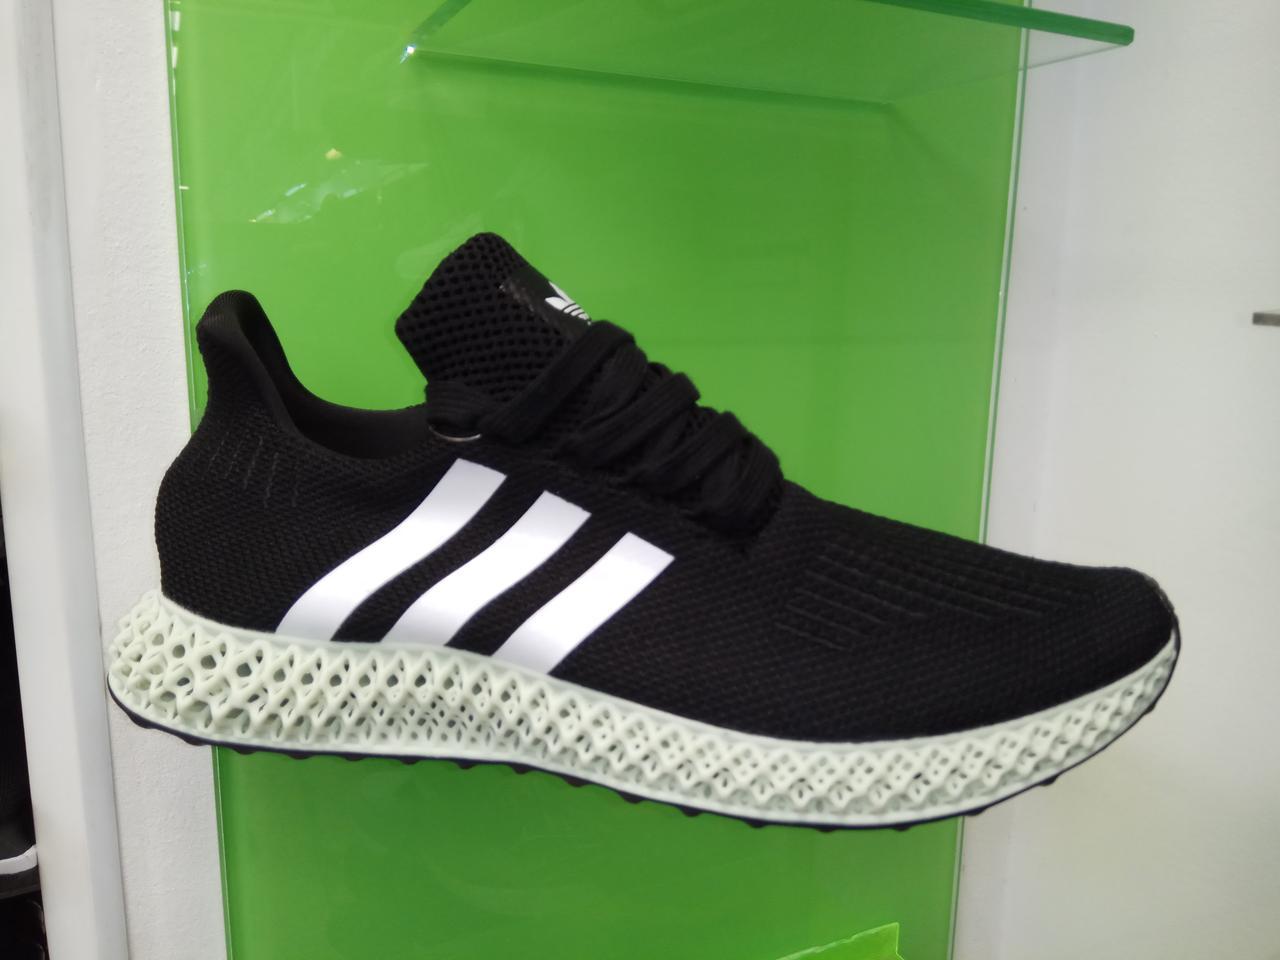 Чоловічі кросівки Adidas Consortium 4 D Futurecraft